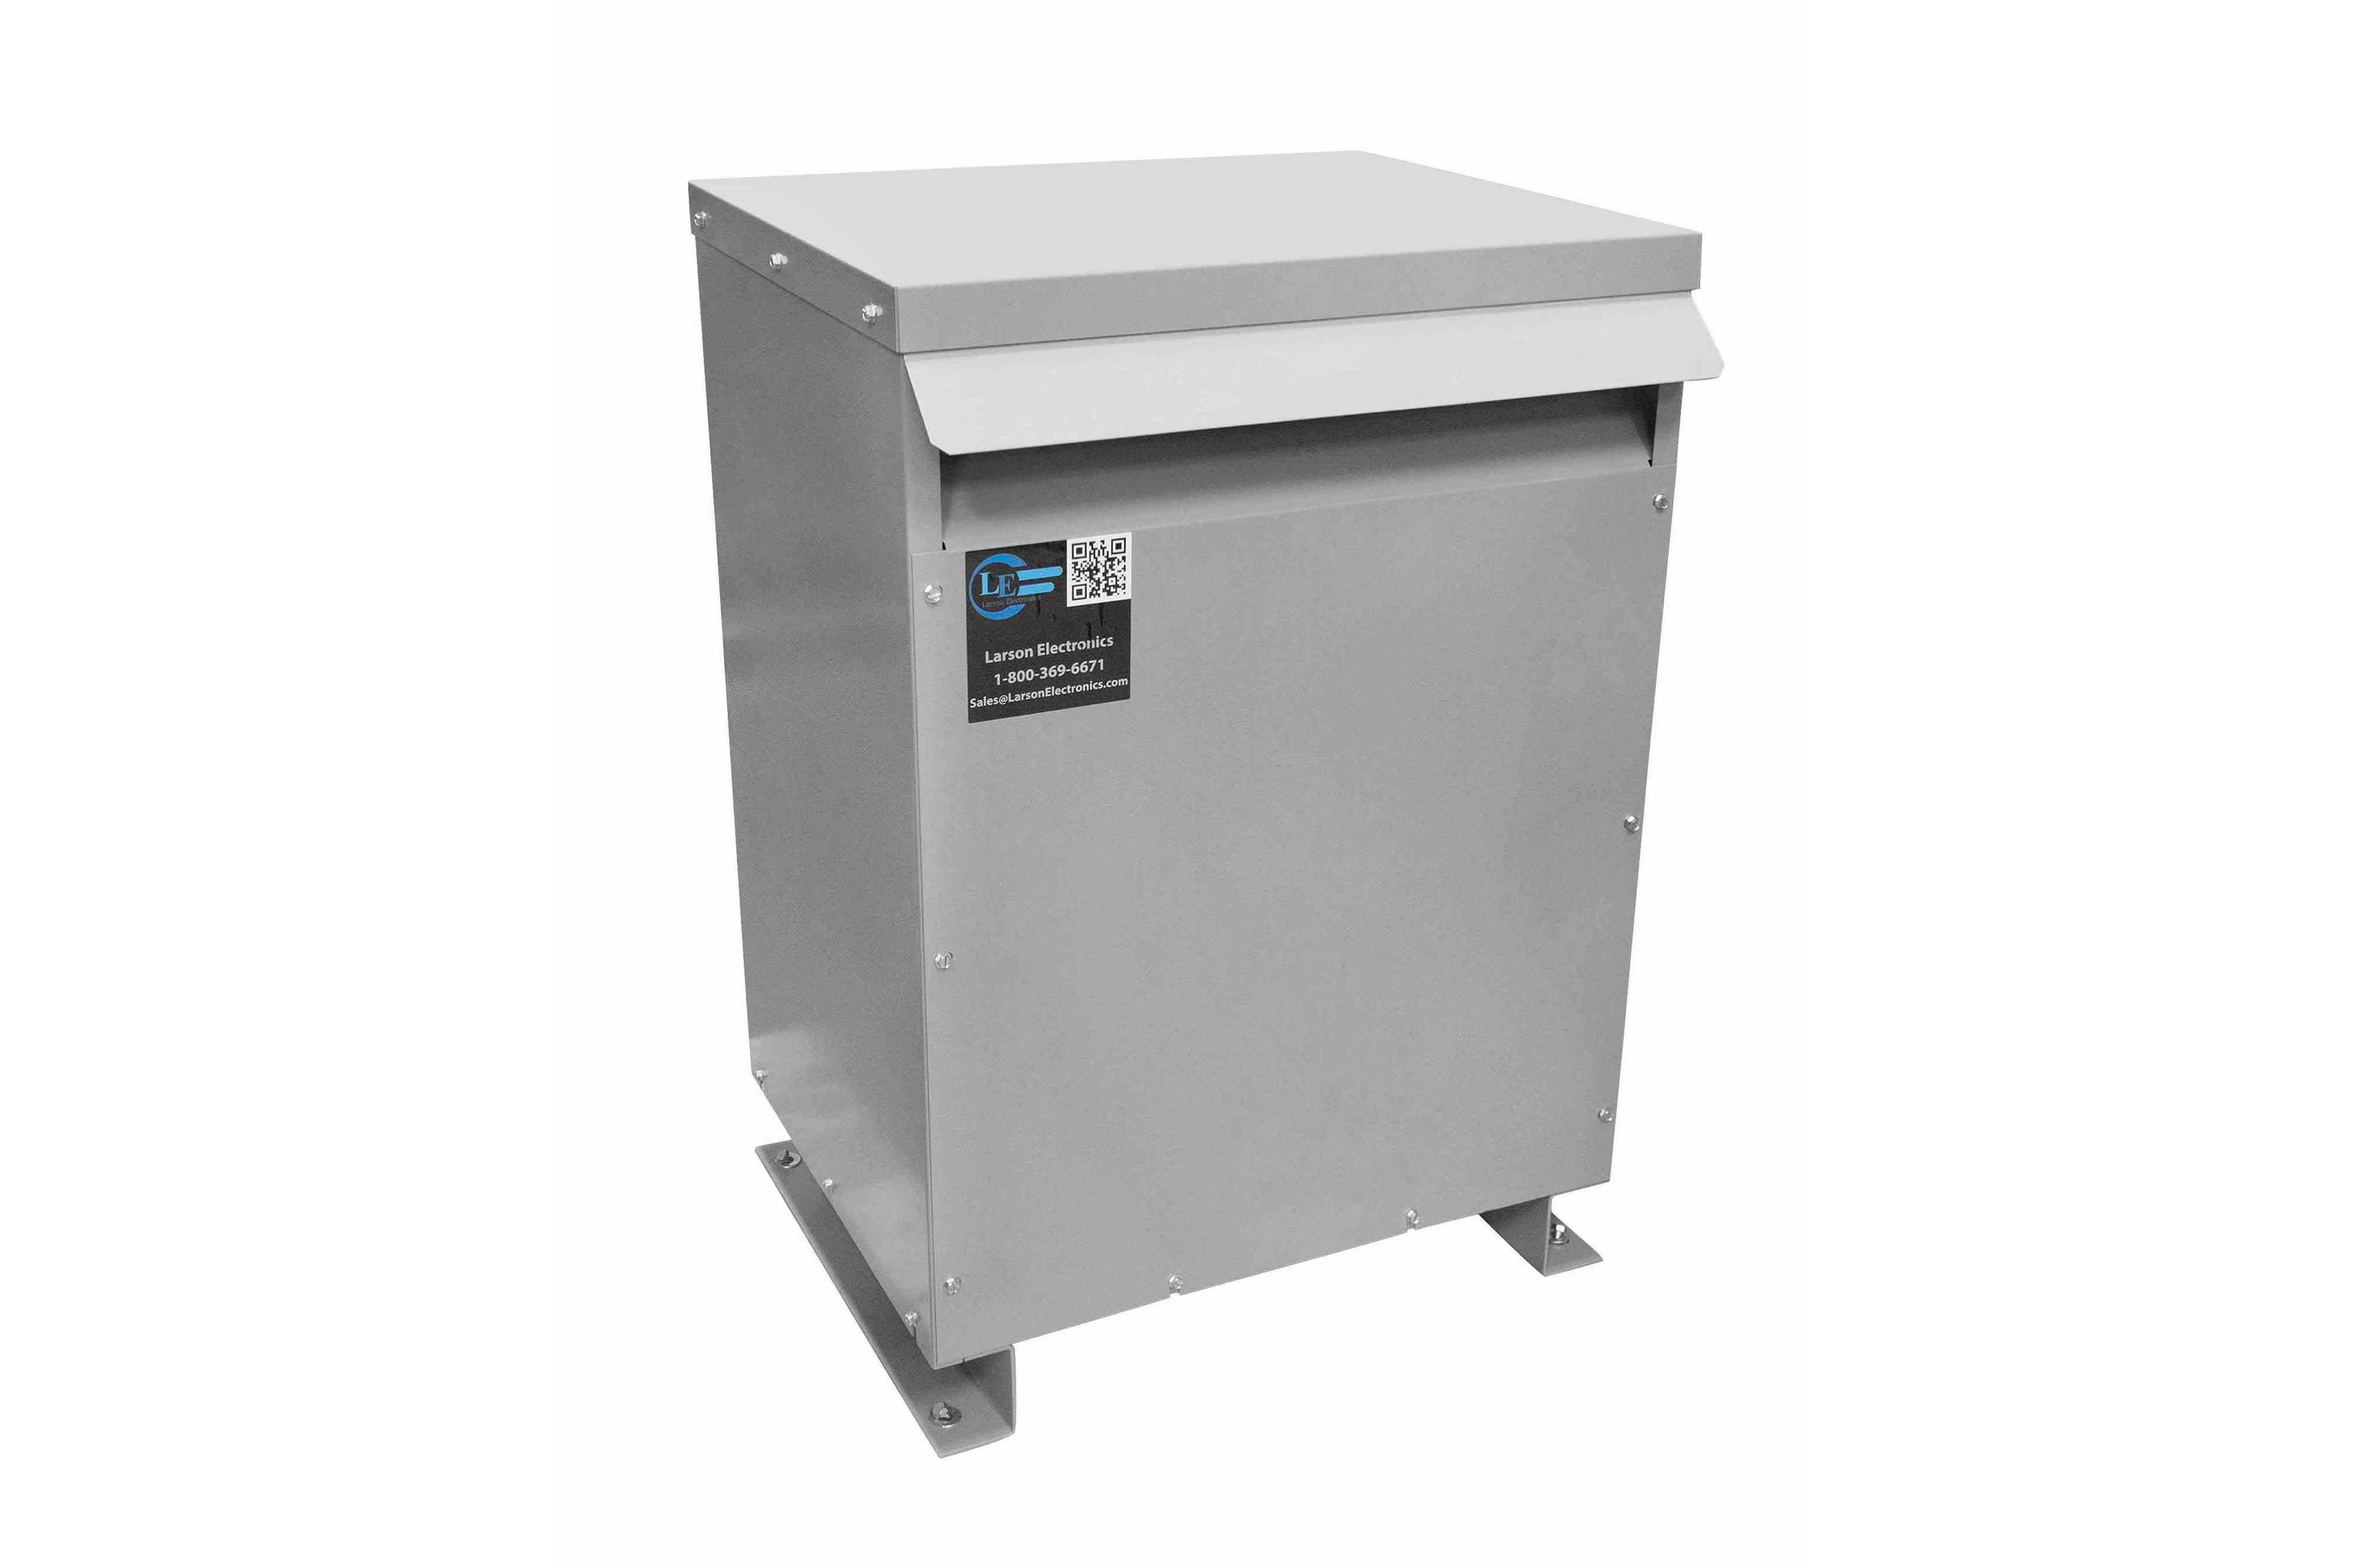 35 kVA 3PH Isolation Transformer, 575V Wye Primary, 415V Delta Secondary, N3R, Ventilated, 60 Hz